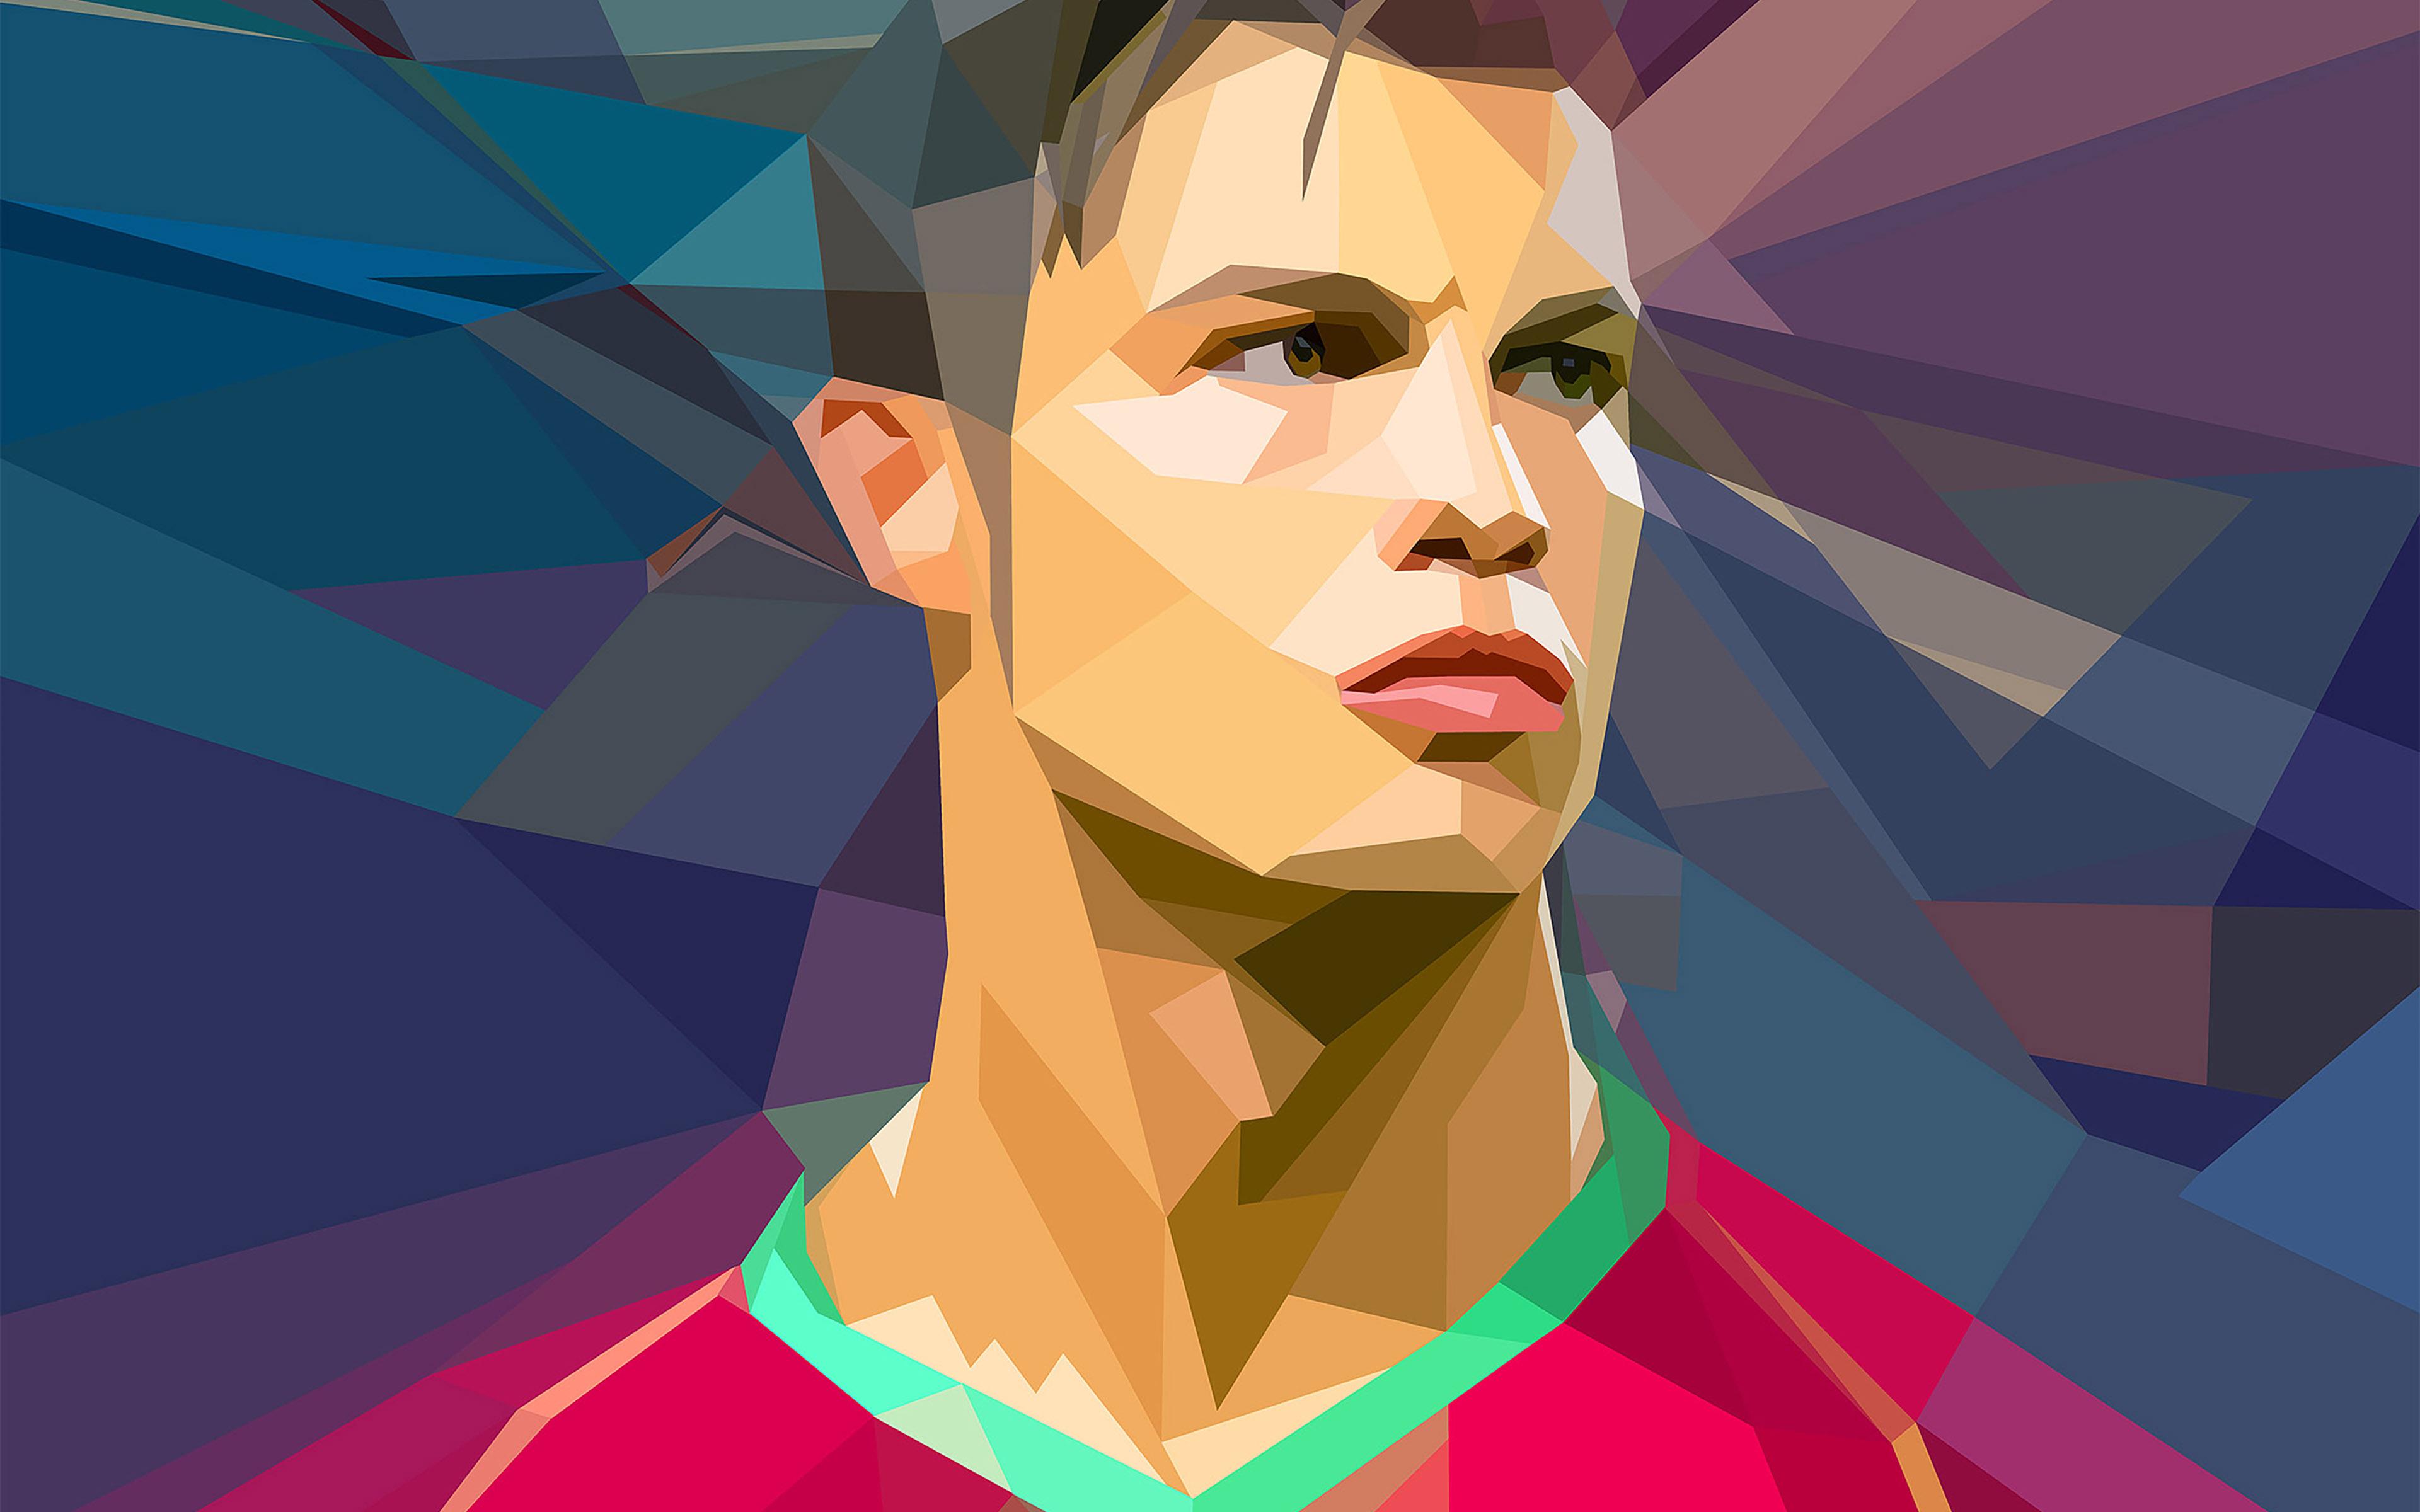 ac47-wallpaper-c-ronaldo-illust-art-soccer-sports - Papers.co